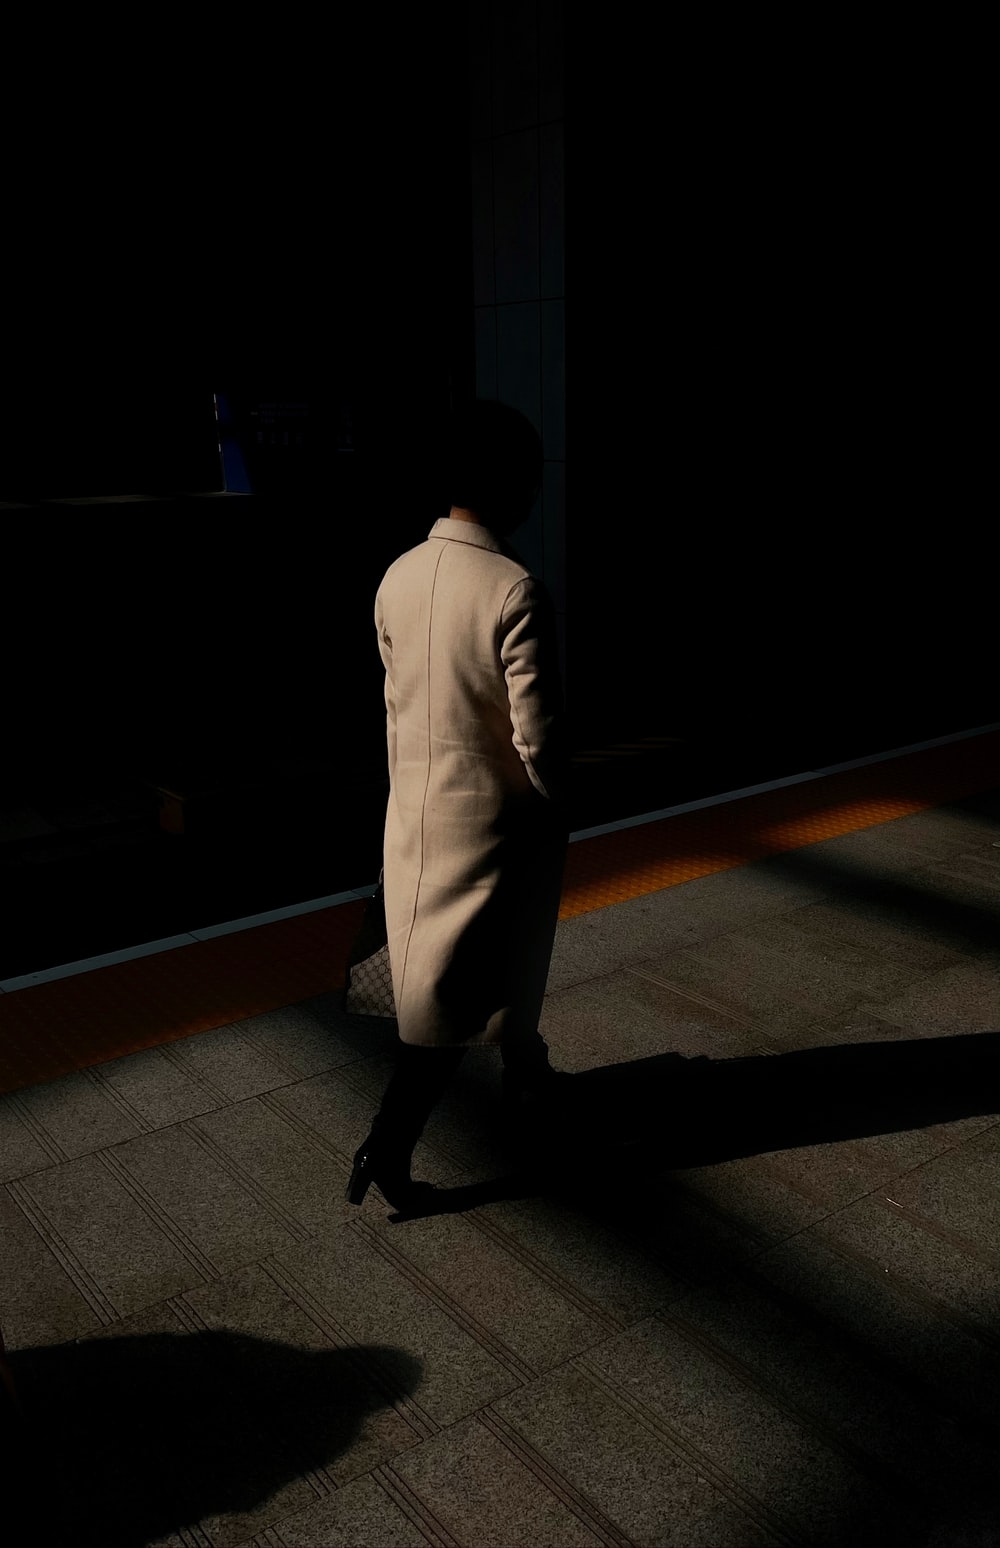 man in white suit walking on brown wooden floor